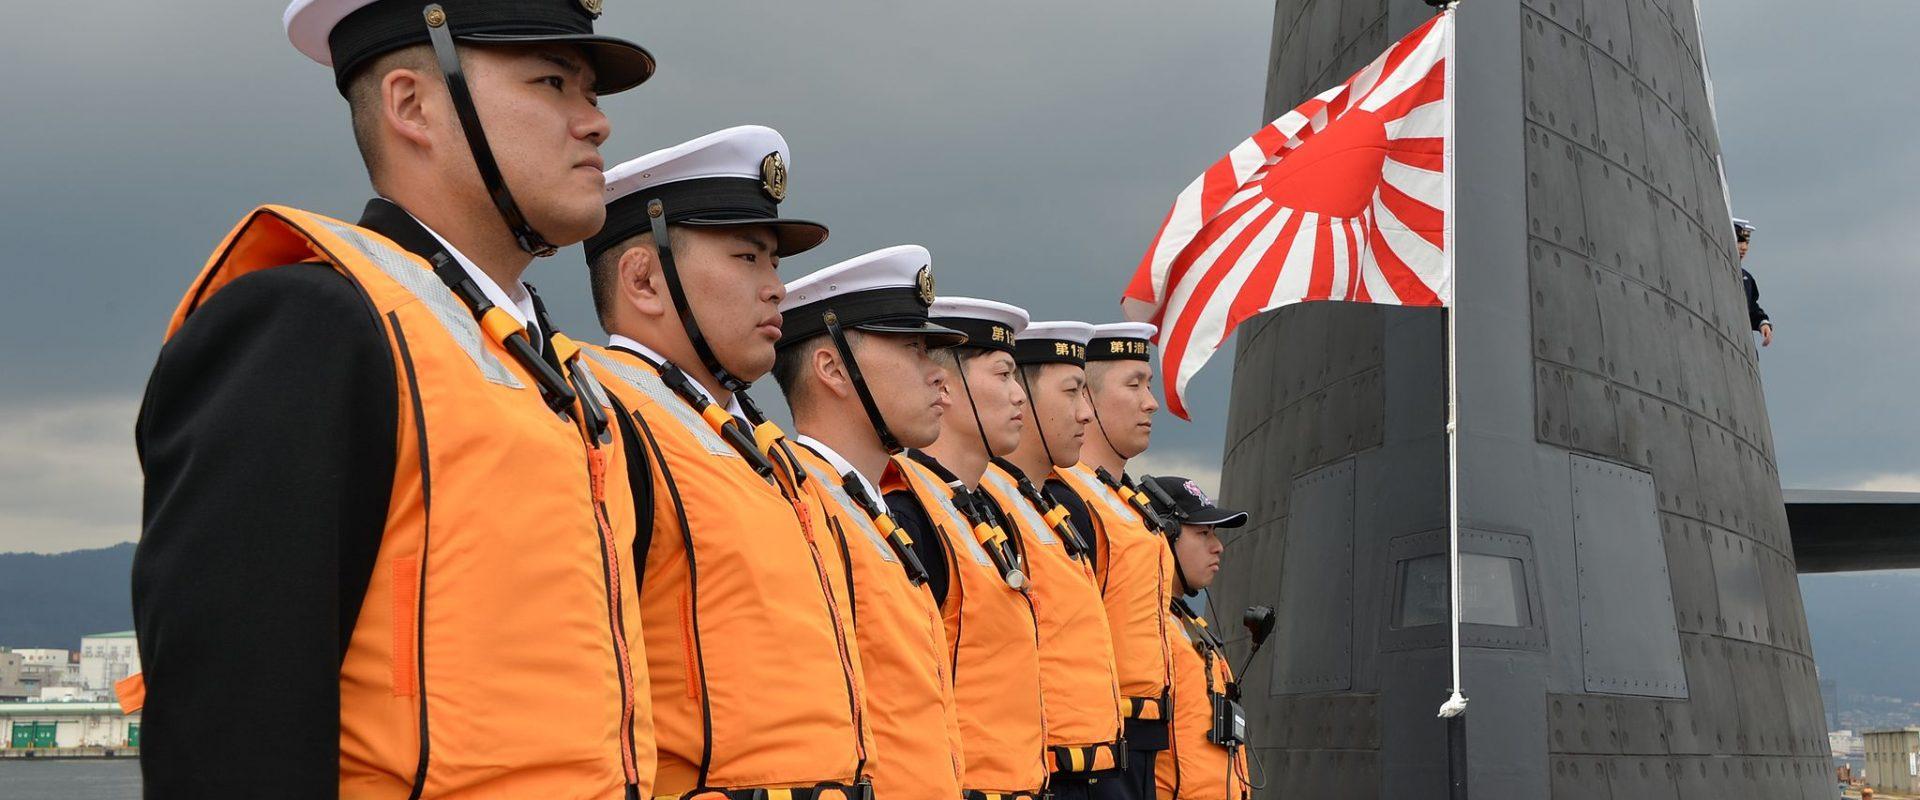 "Permalink to: The Legitimacy of Informal Constitutional Amendment and the ""Reinterpretation"" of Japan's War Powers"